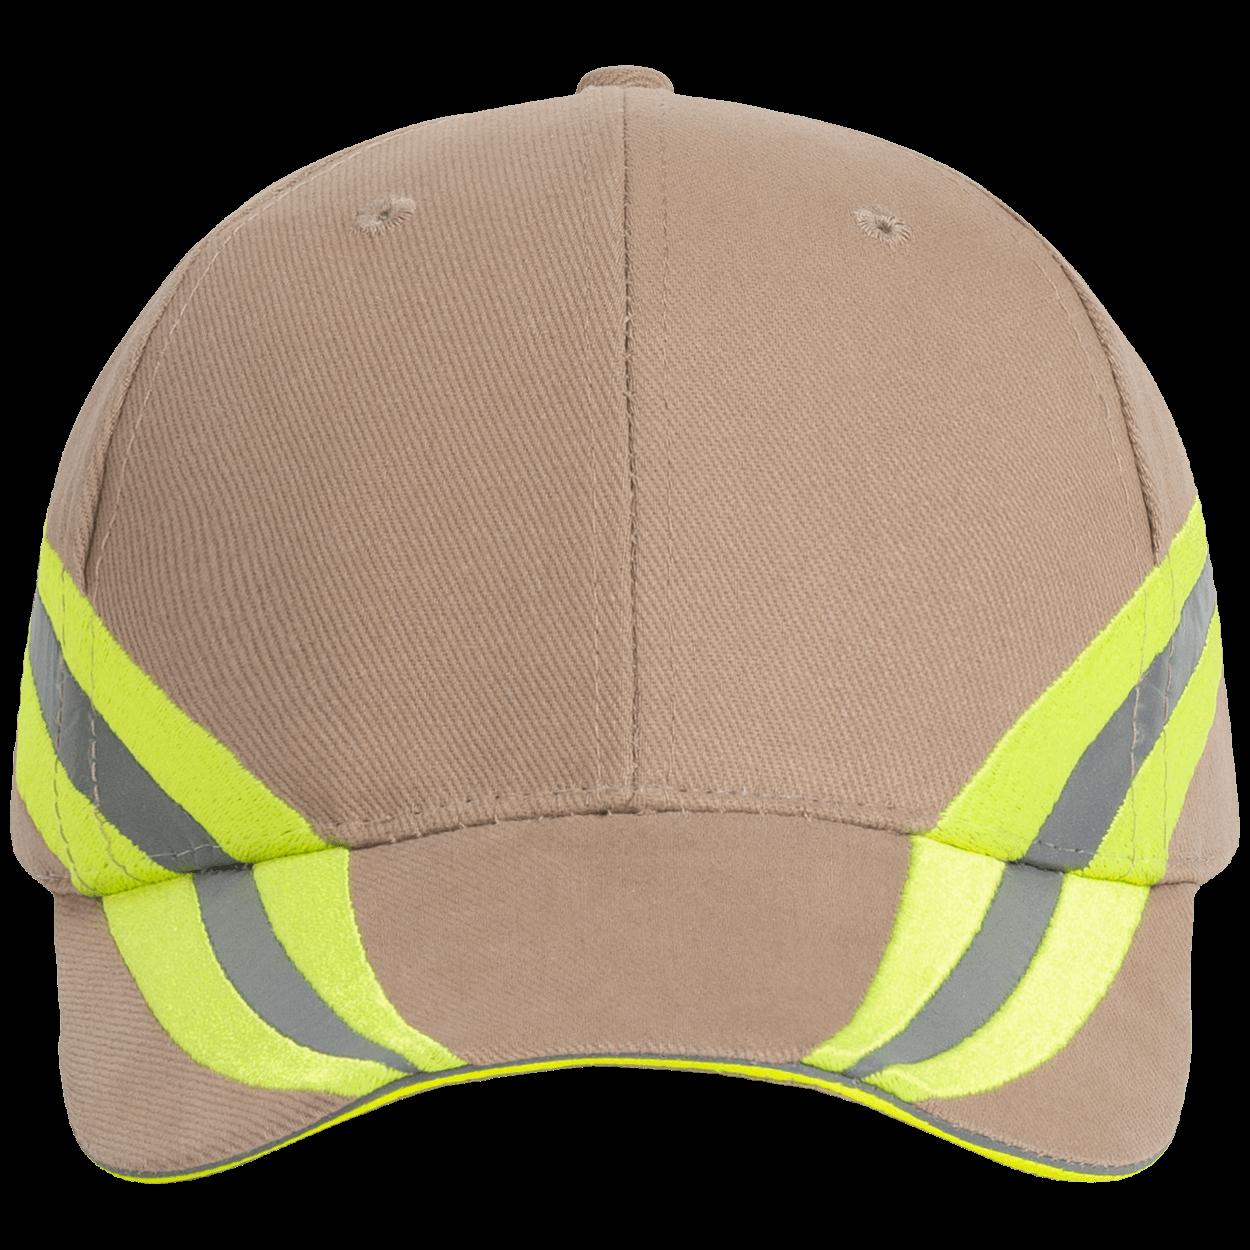 Feuerwehr Basecap gold